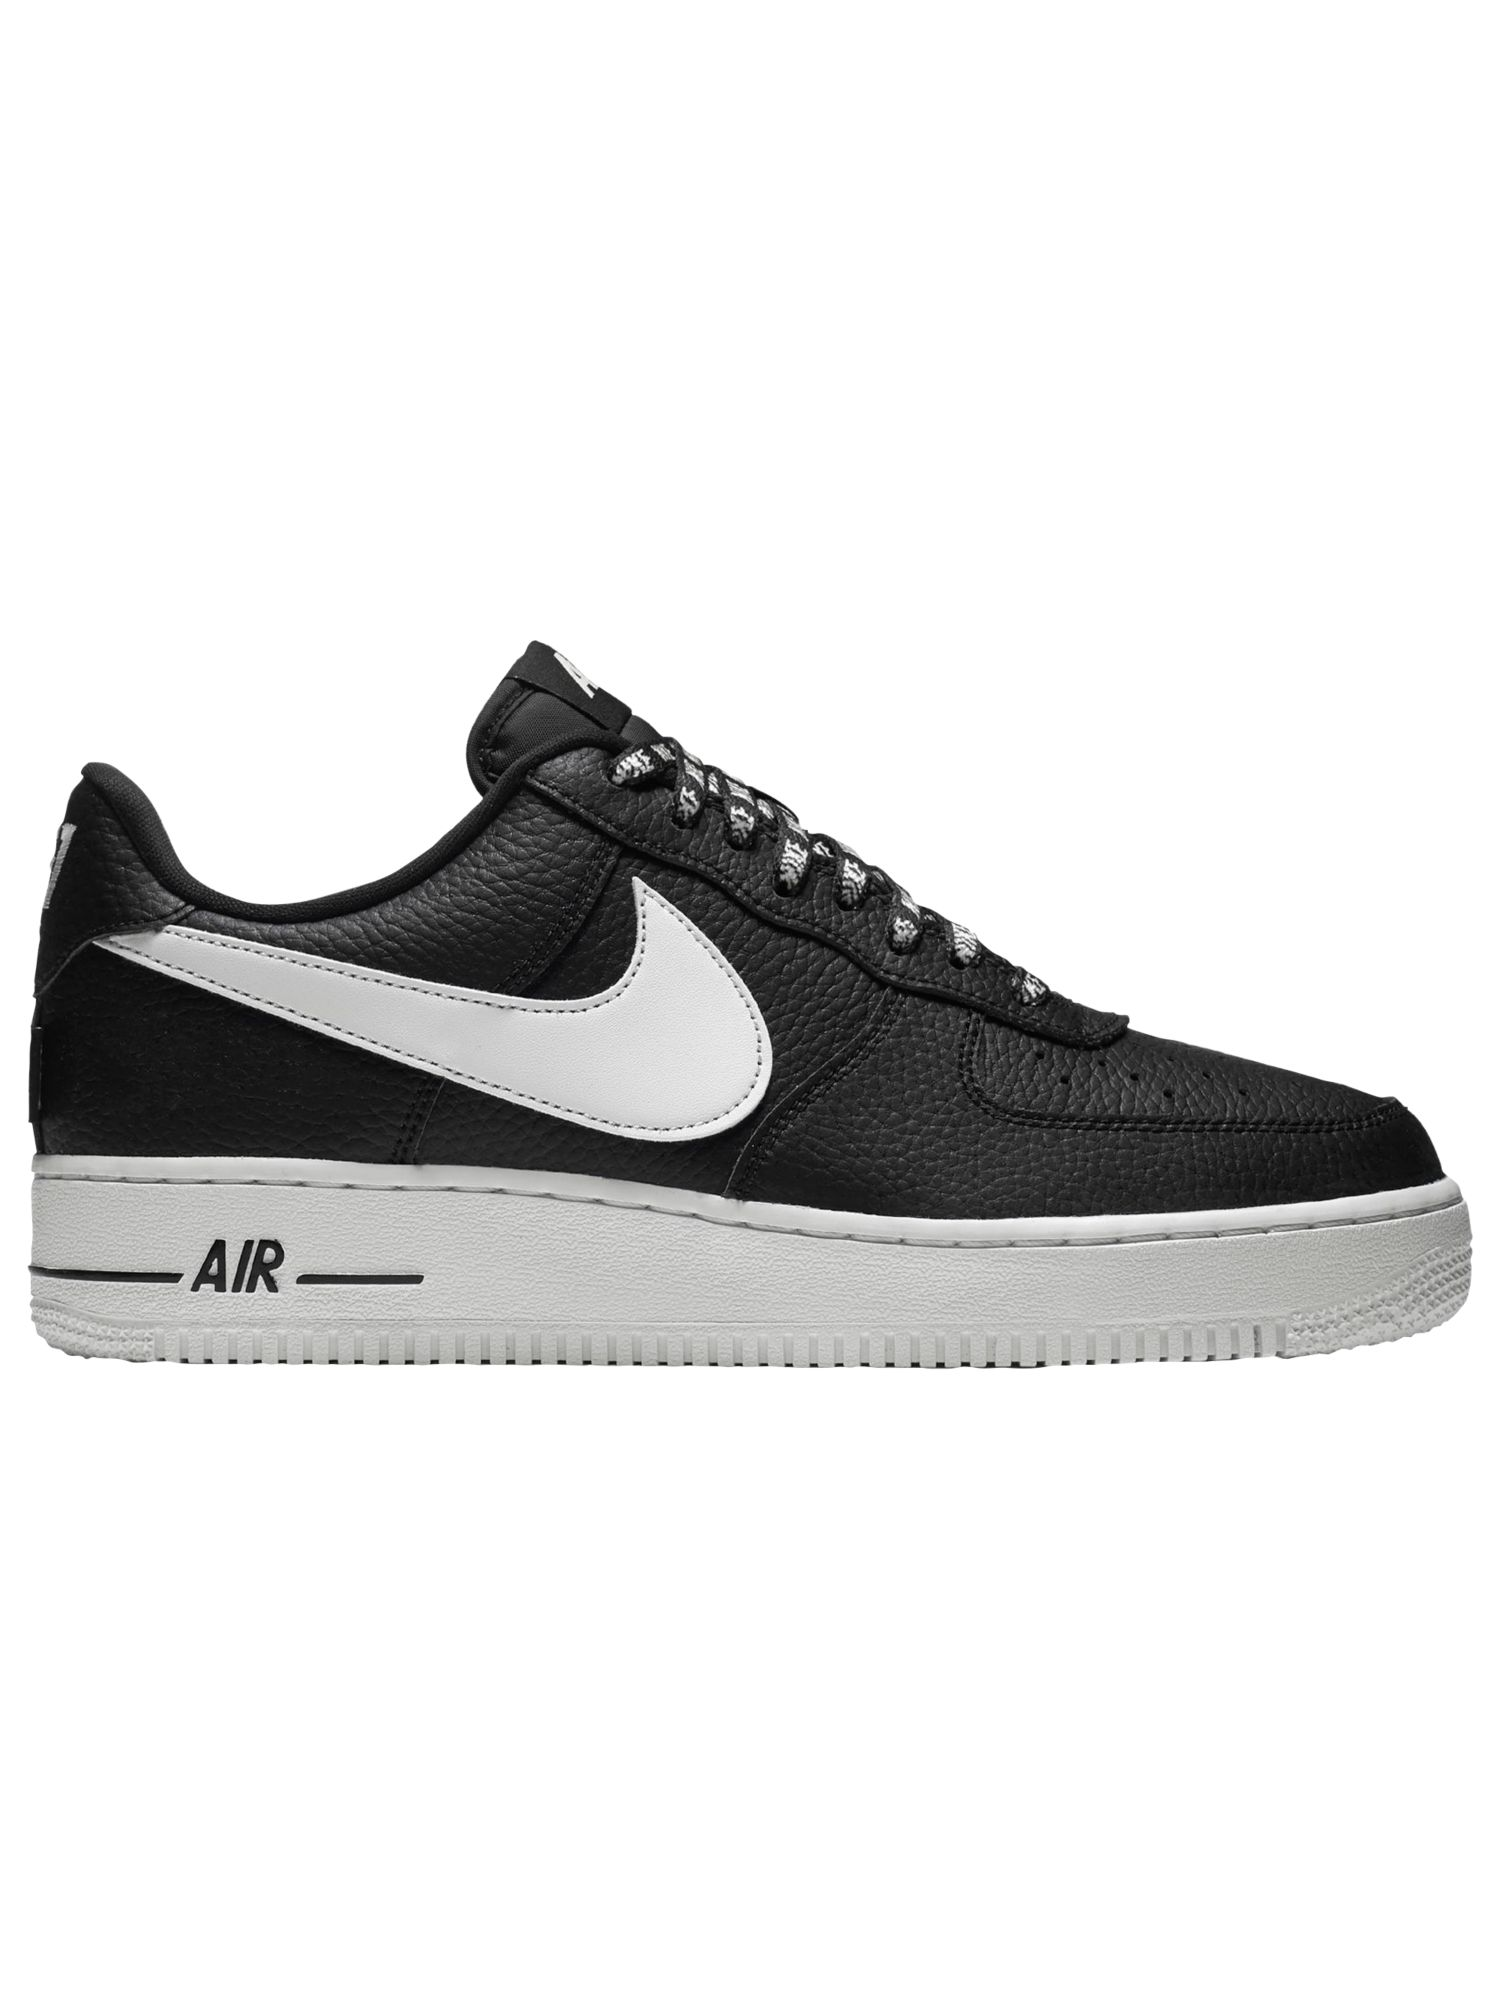 960debc50e4c purchase nike boys kyrie 3 colorblock mids basketball shoes 32aea ef96b   coupon code for nike air force 1 07 lv8 nba mens basketball shoes black  white 0868a